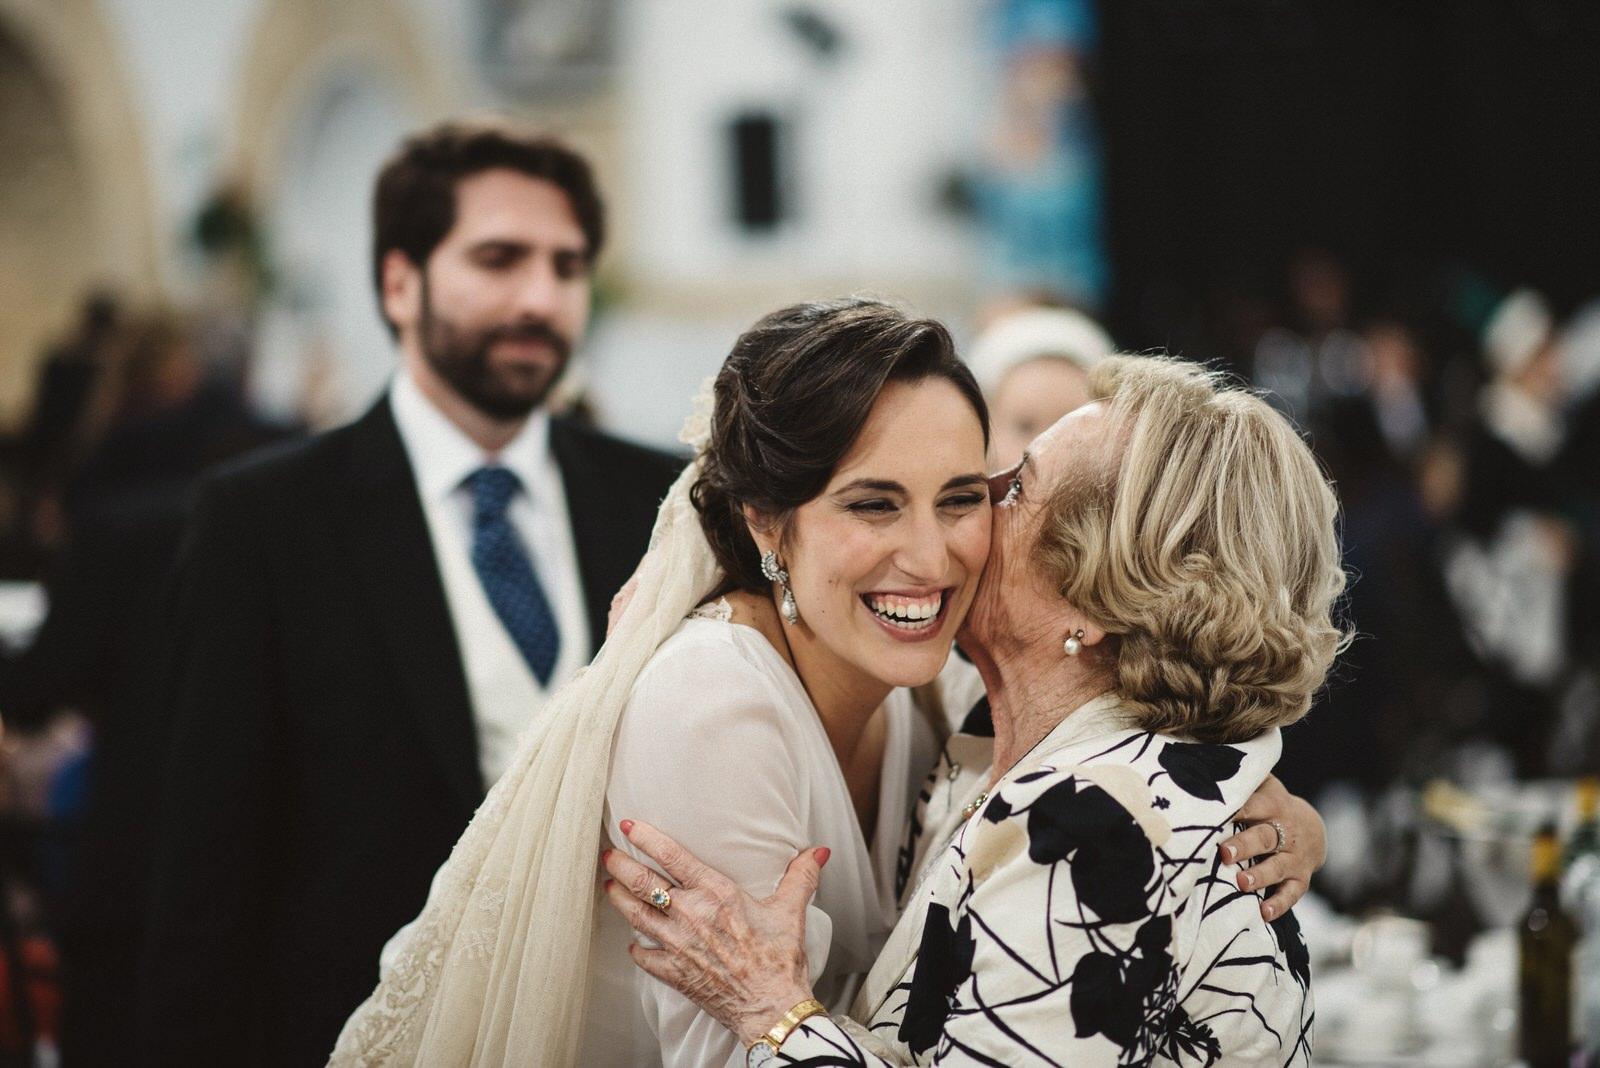 fotografo de bodas sevilla - fotografo boda - fotografía sevilla - Andrés AmarilloAAA_5472- tele- fine.JPG